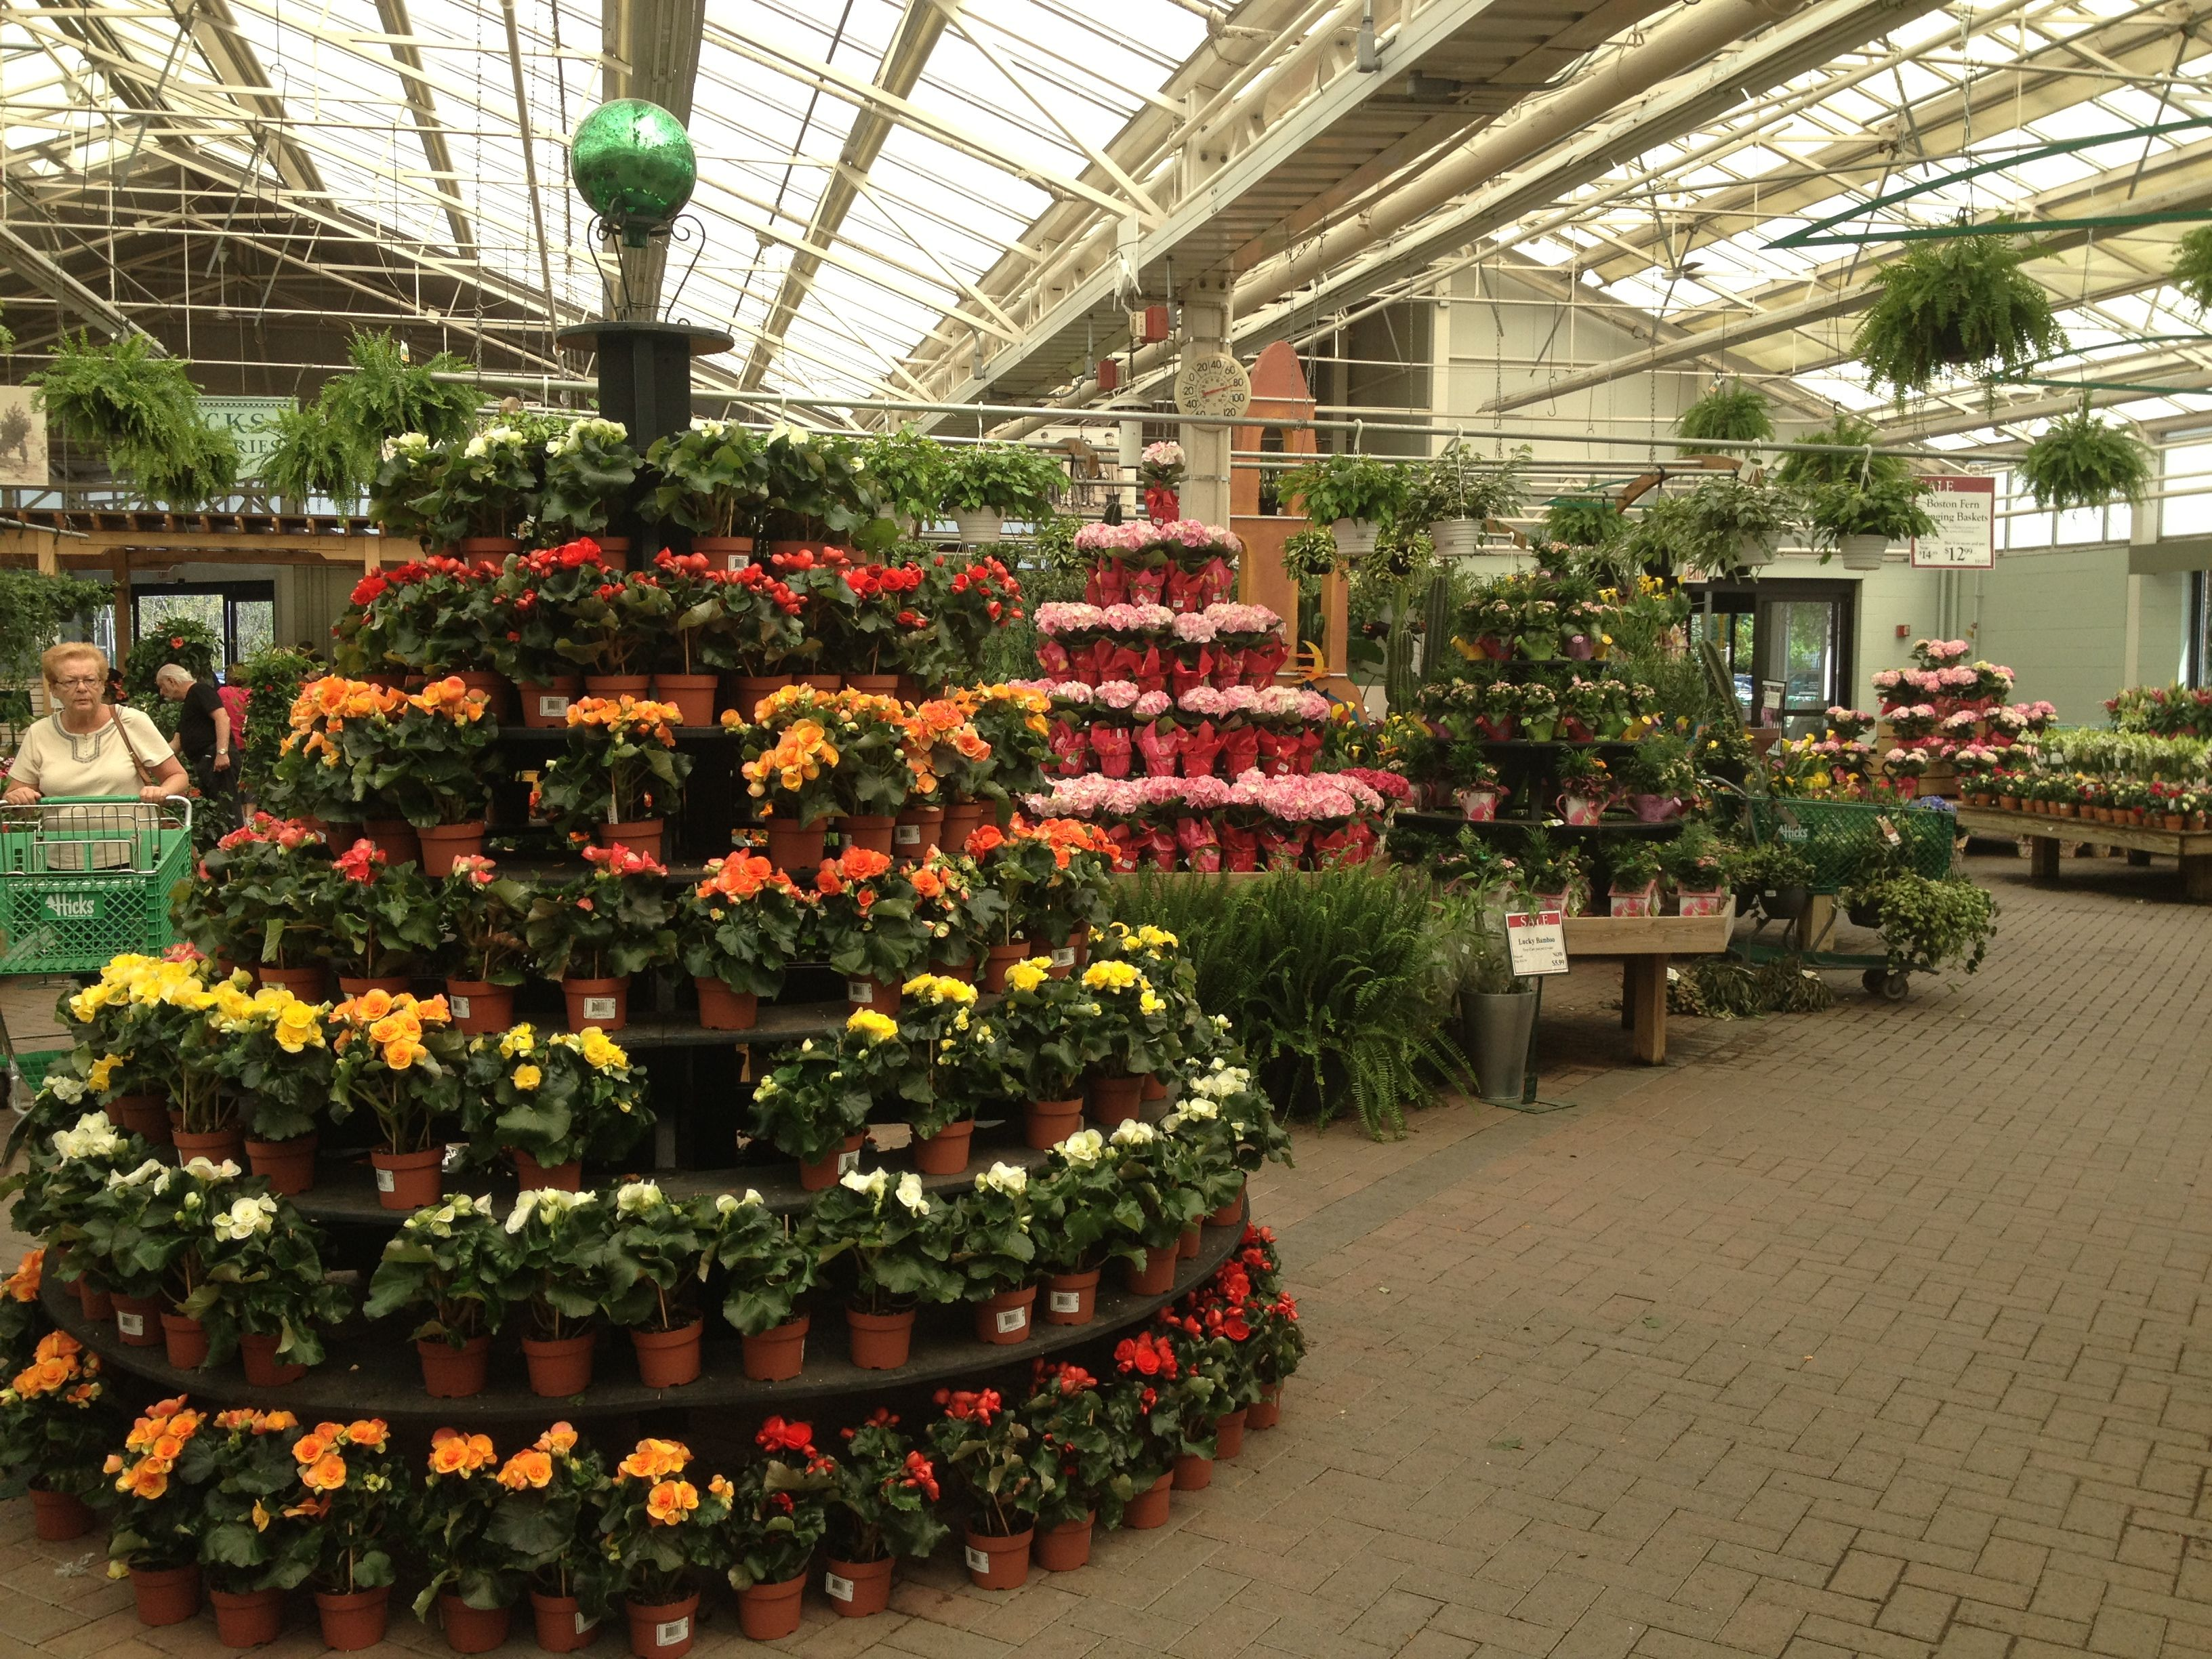 Maiin Greenhouse Hicks Nurseries. Summer